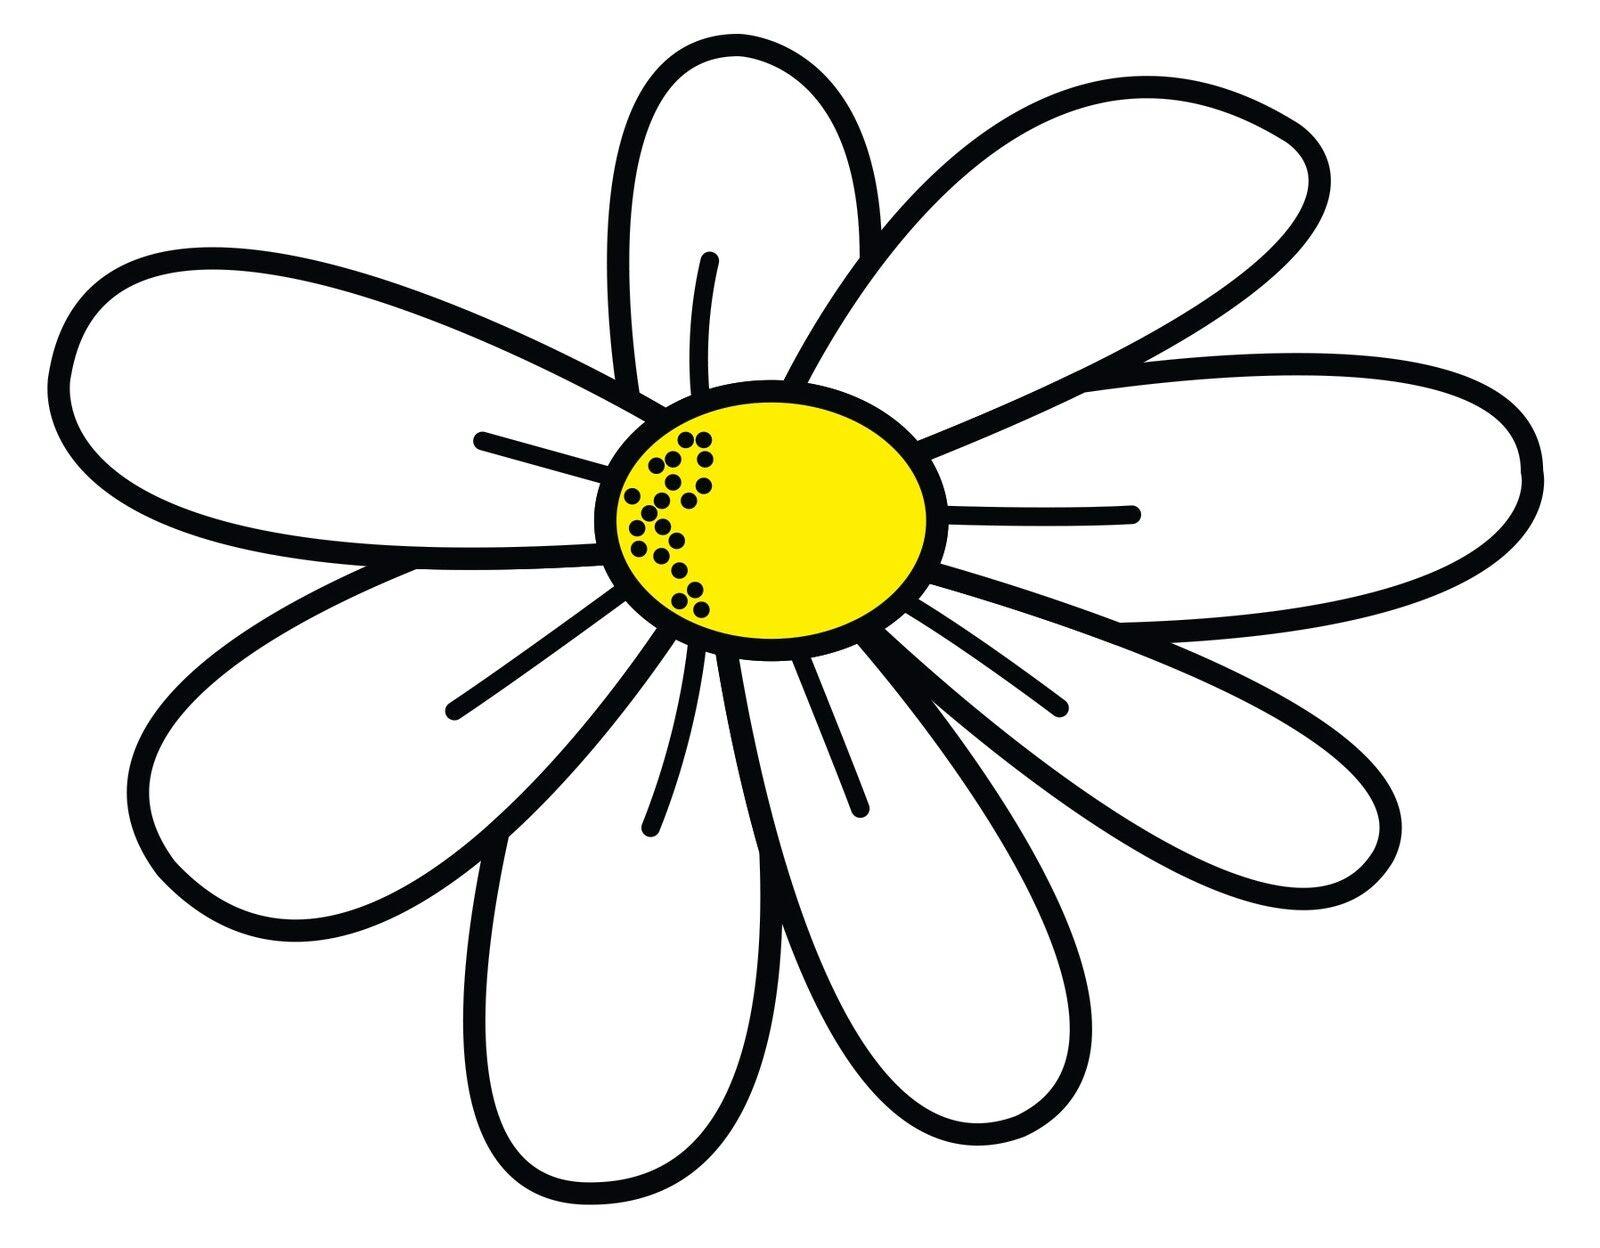 Daisy-Rae Designs